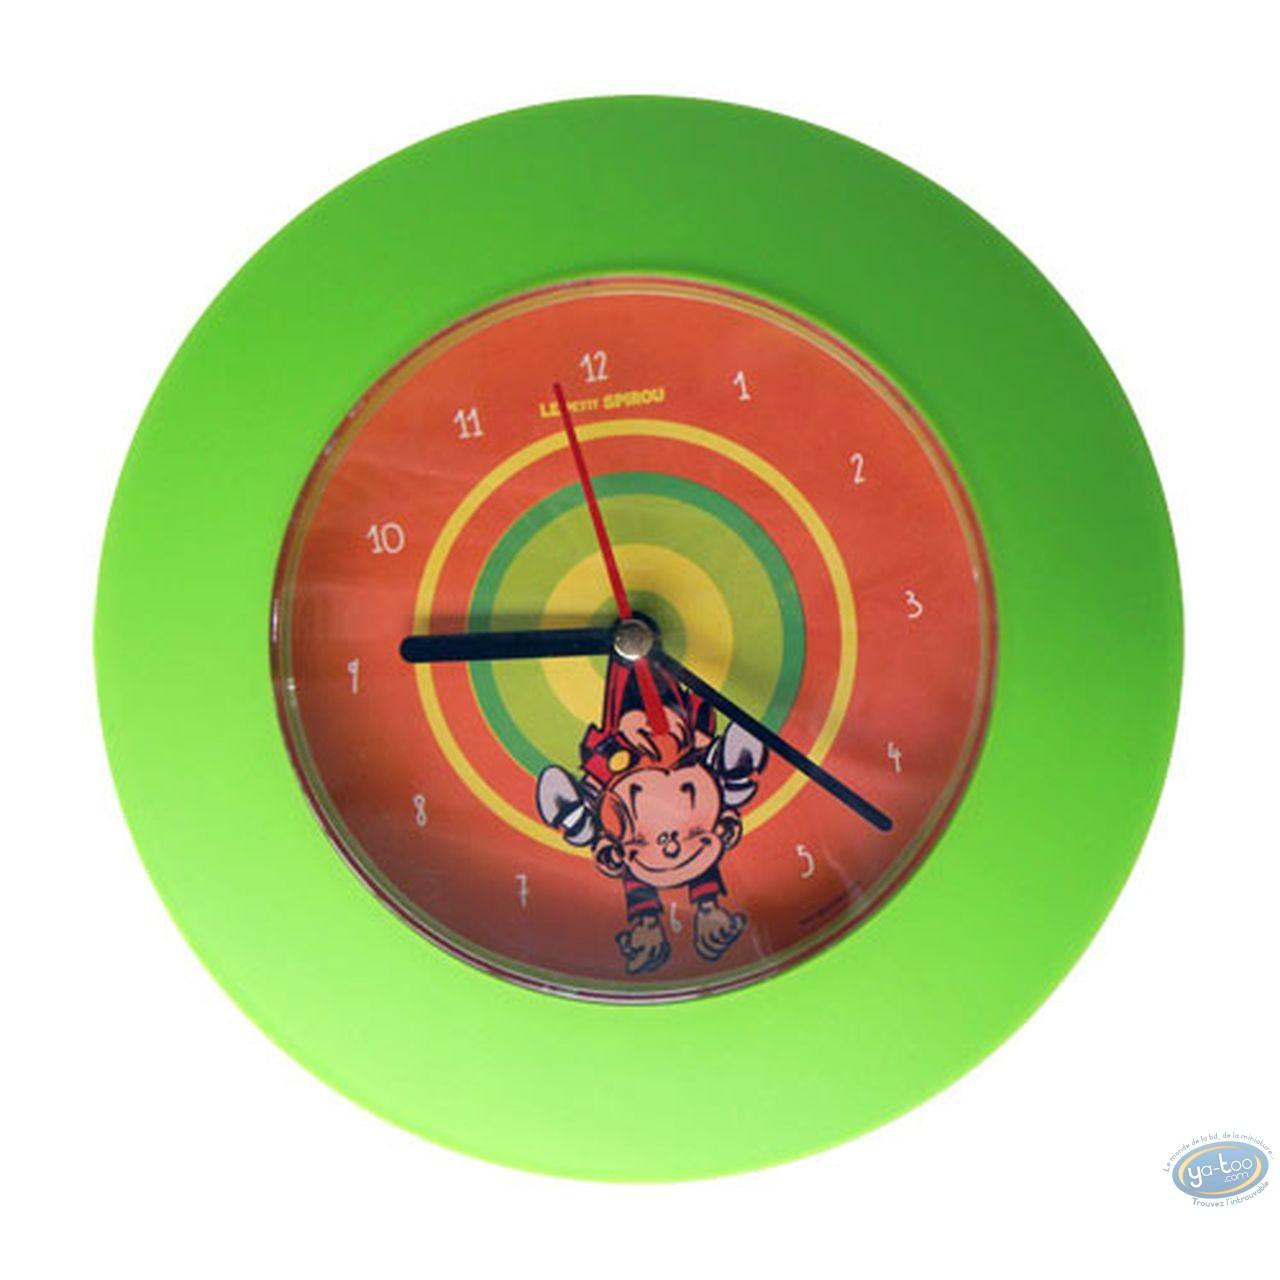 Clocks & Watches, Young Spirou : Le Petit Spirou : Clock